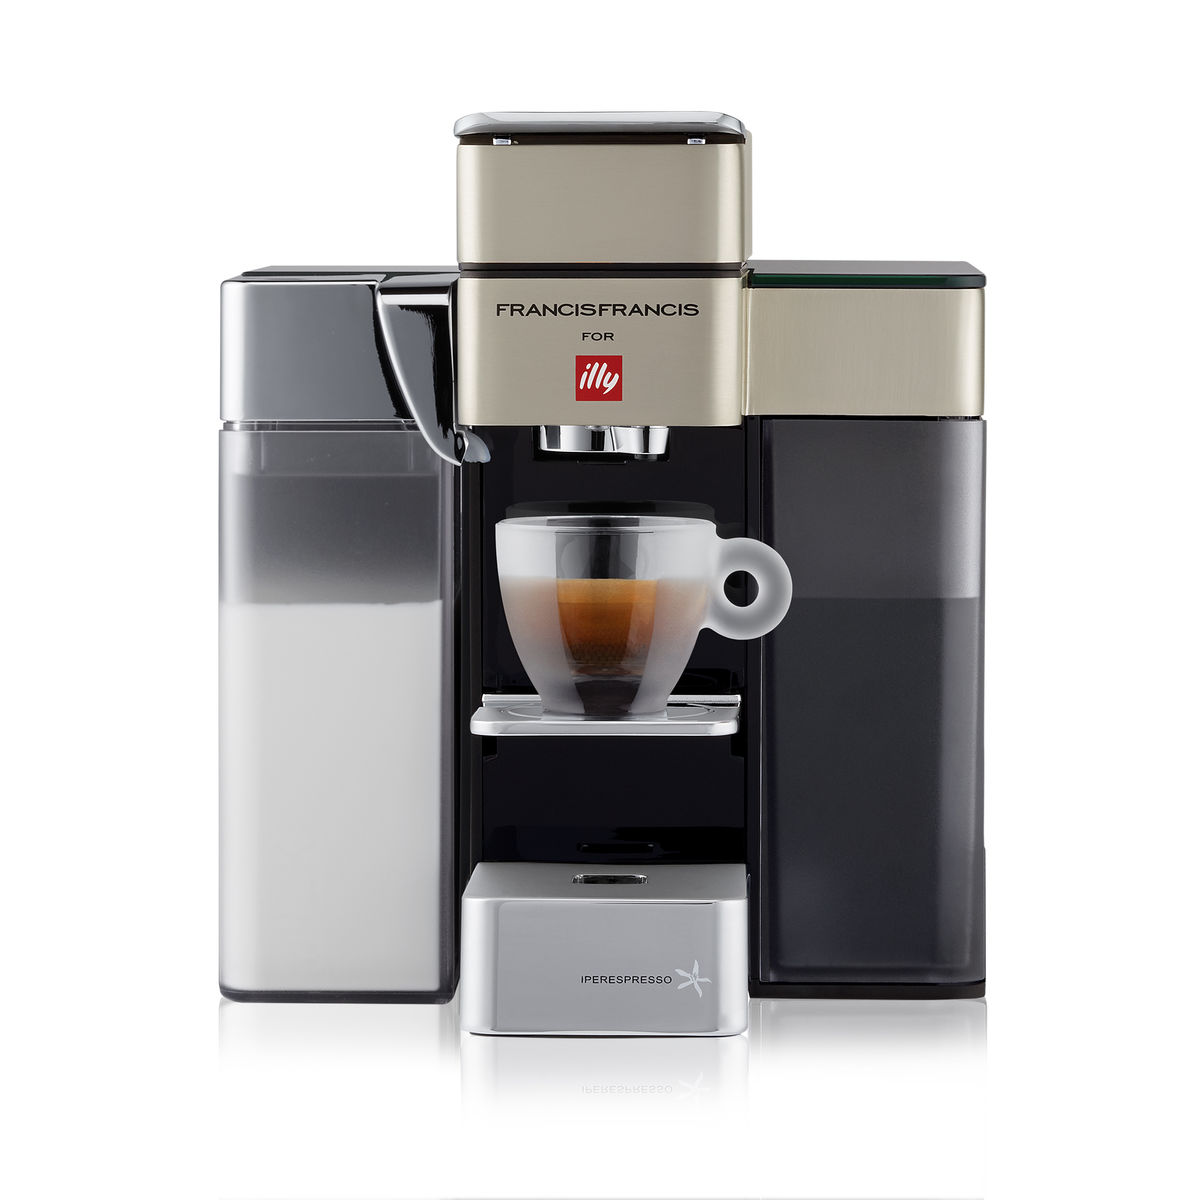 illy Y5 iperEspresso Milk, Espresso & Coffee Machine - Satin